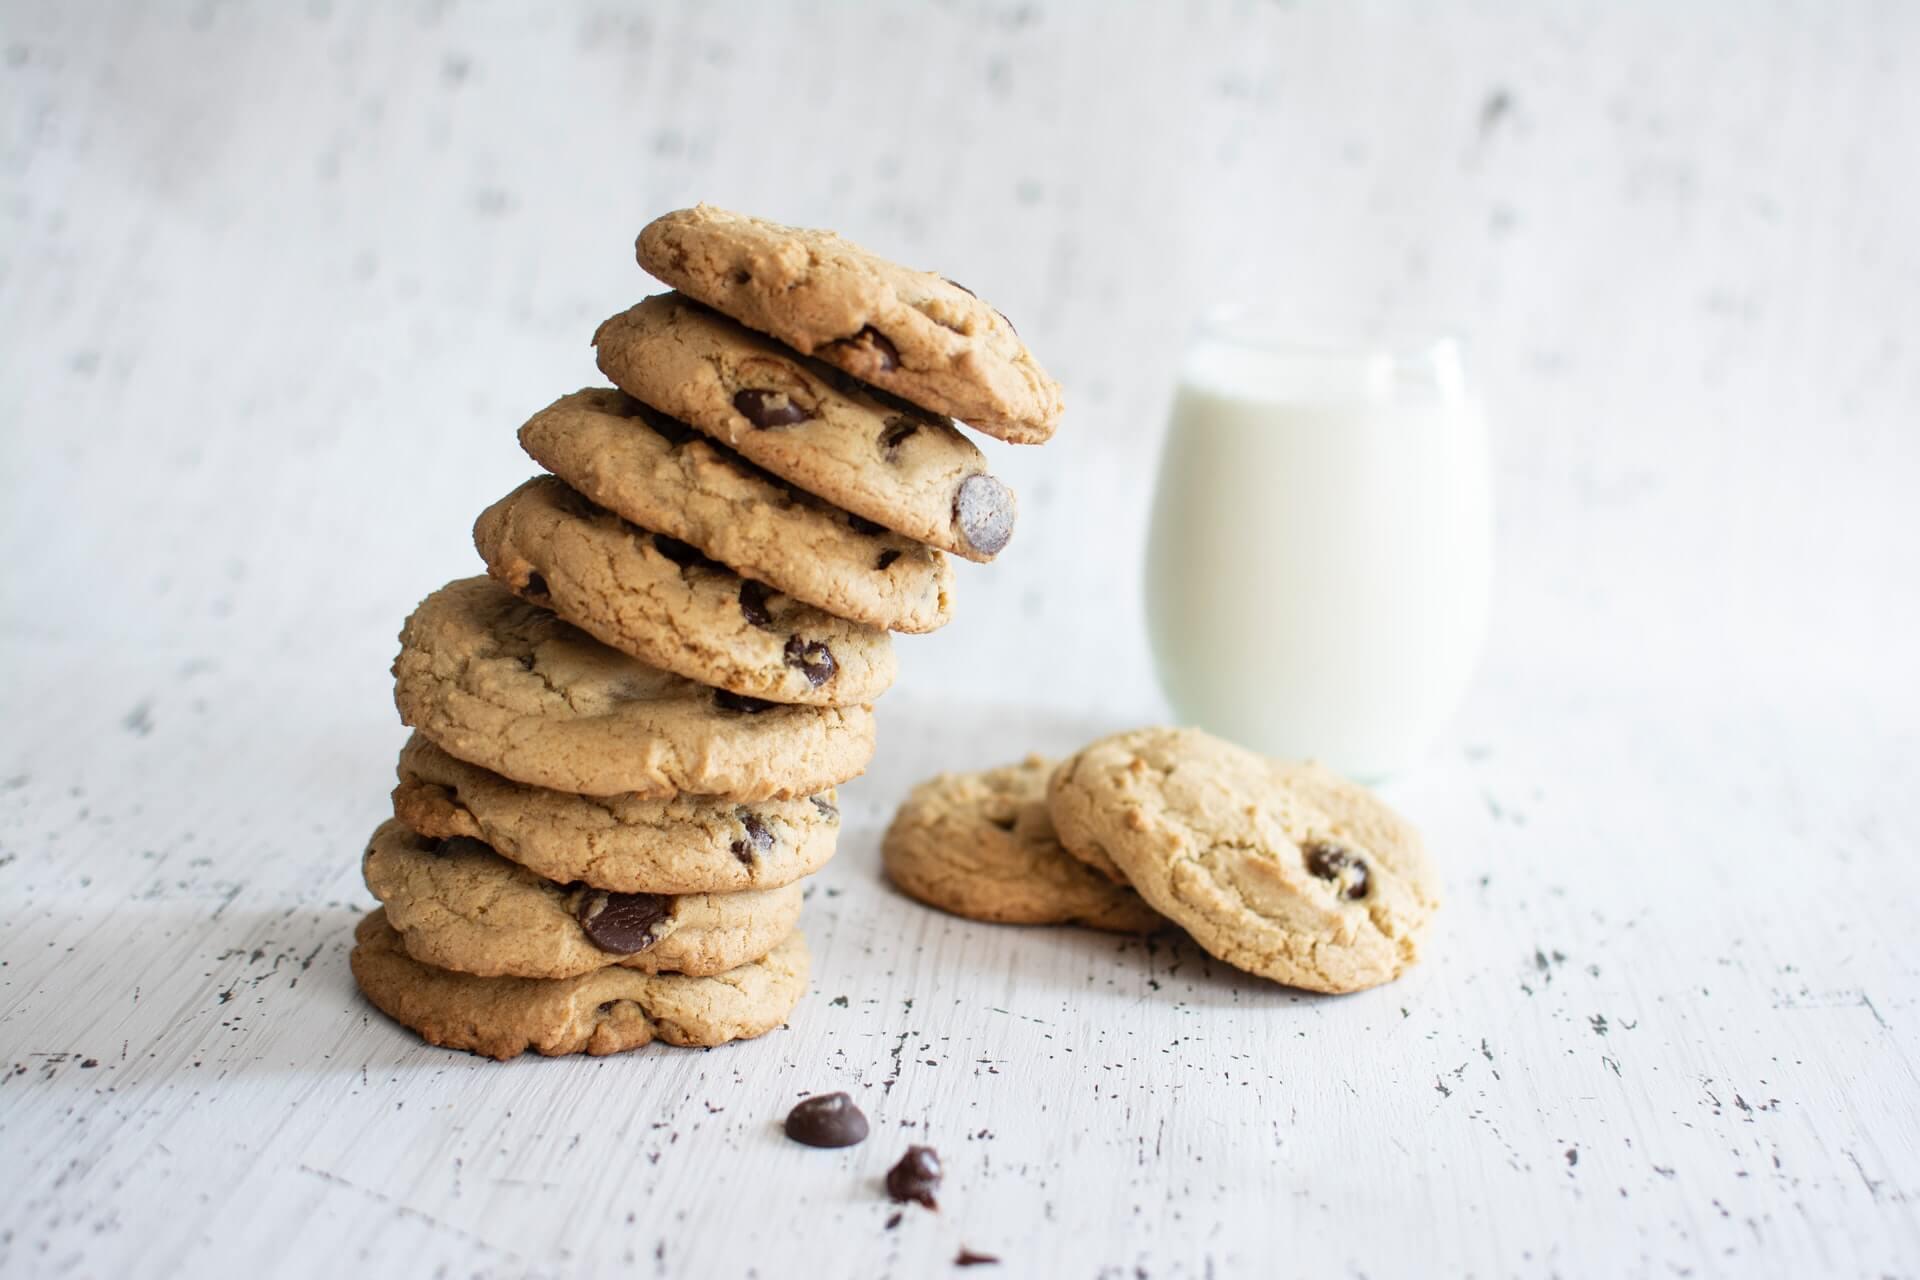 Tiff's Treats Cookies